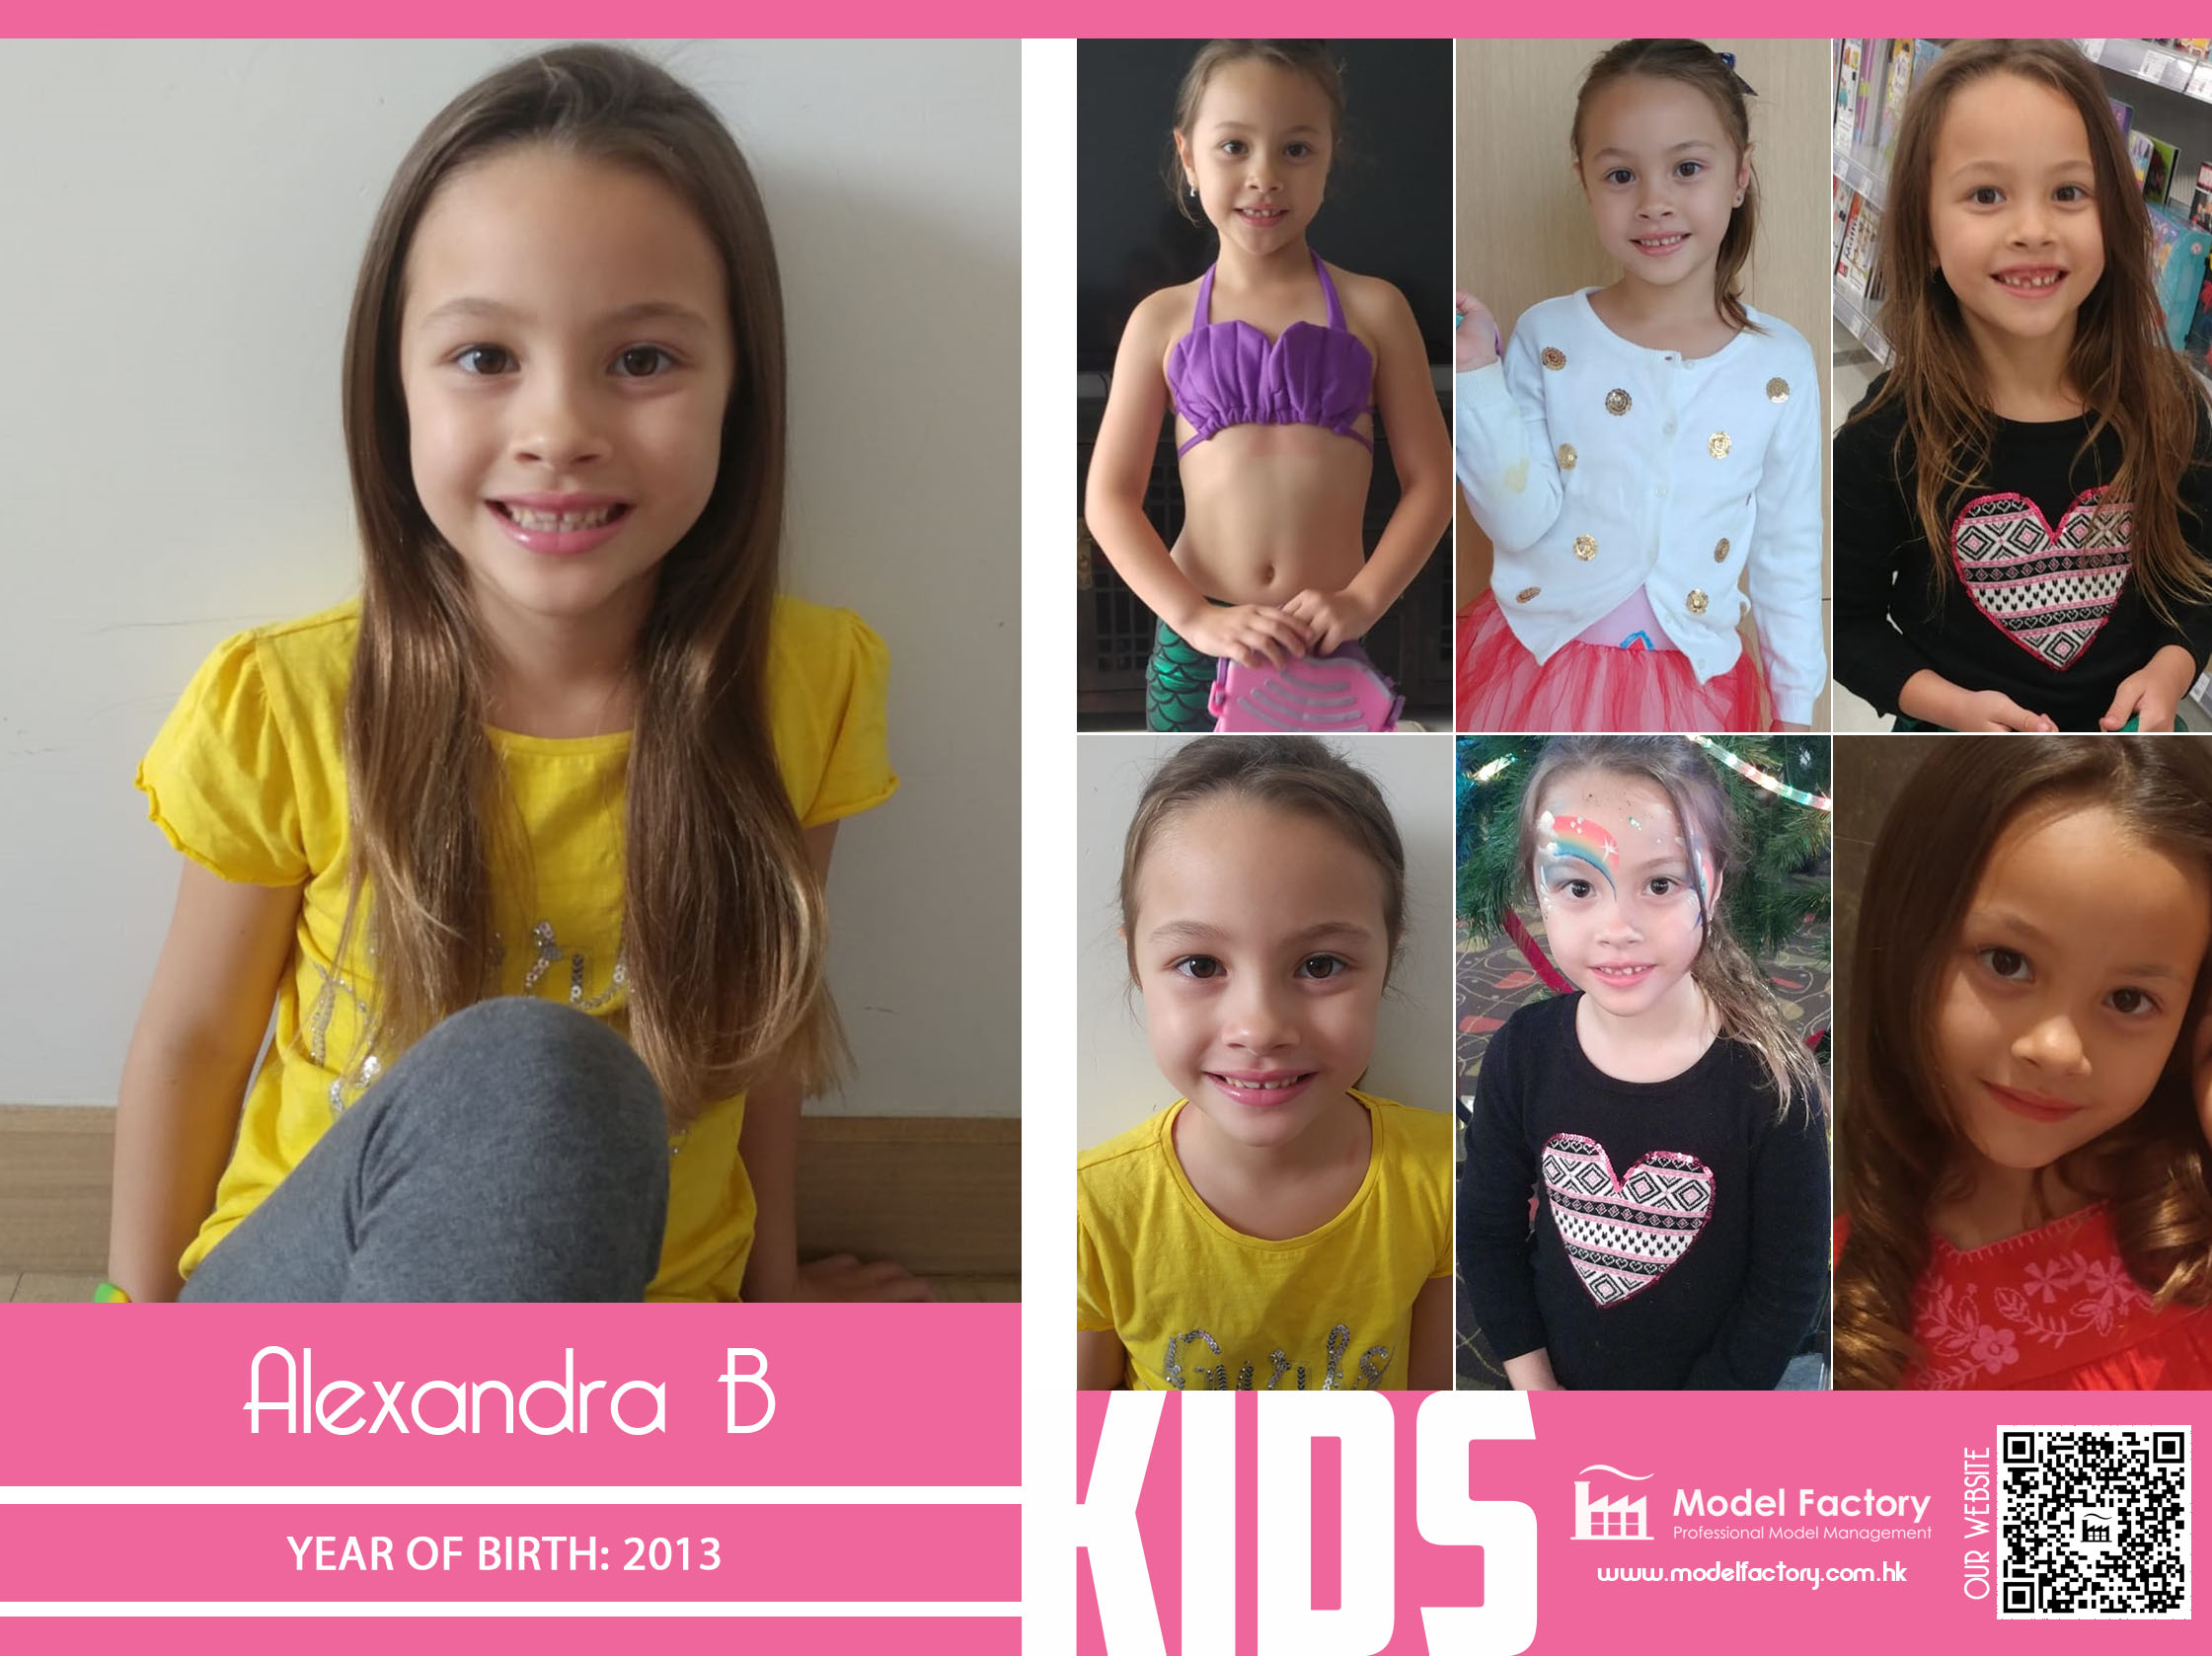 Model Factory Caucasian Kids Alexandra B